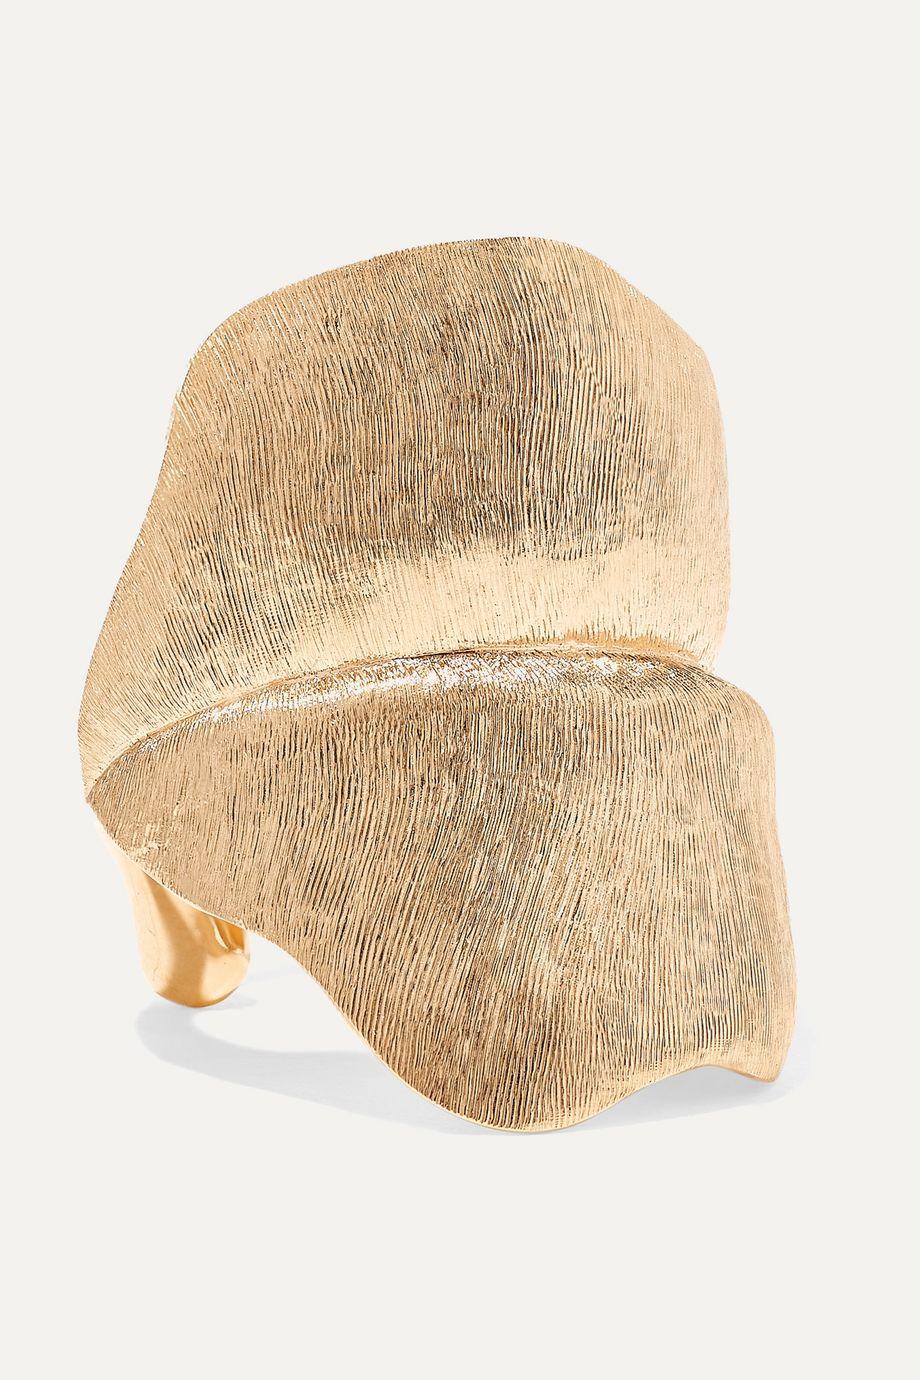 OLE LYNGGAARD COPENHAGEN Leaves large 18-karat gold ring